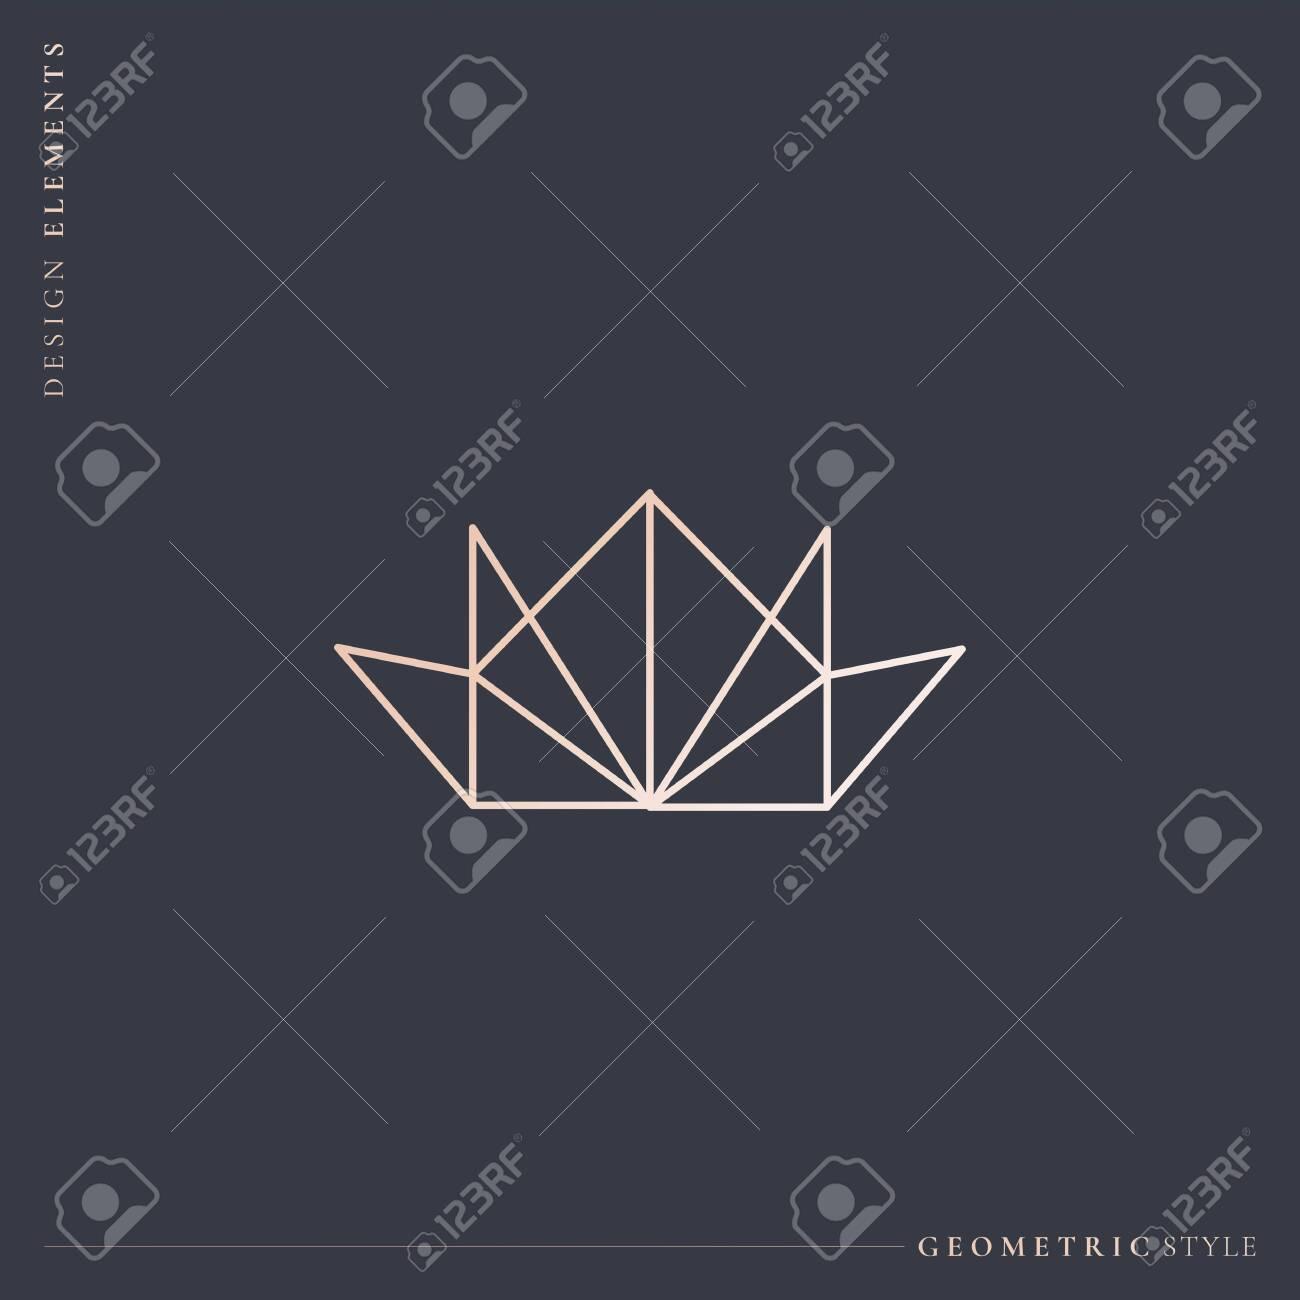 Luxurious geometric crown design vector illustration - 121951648